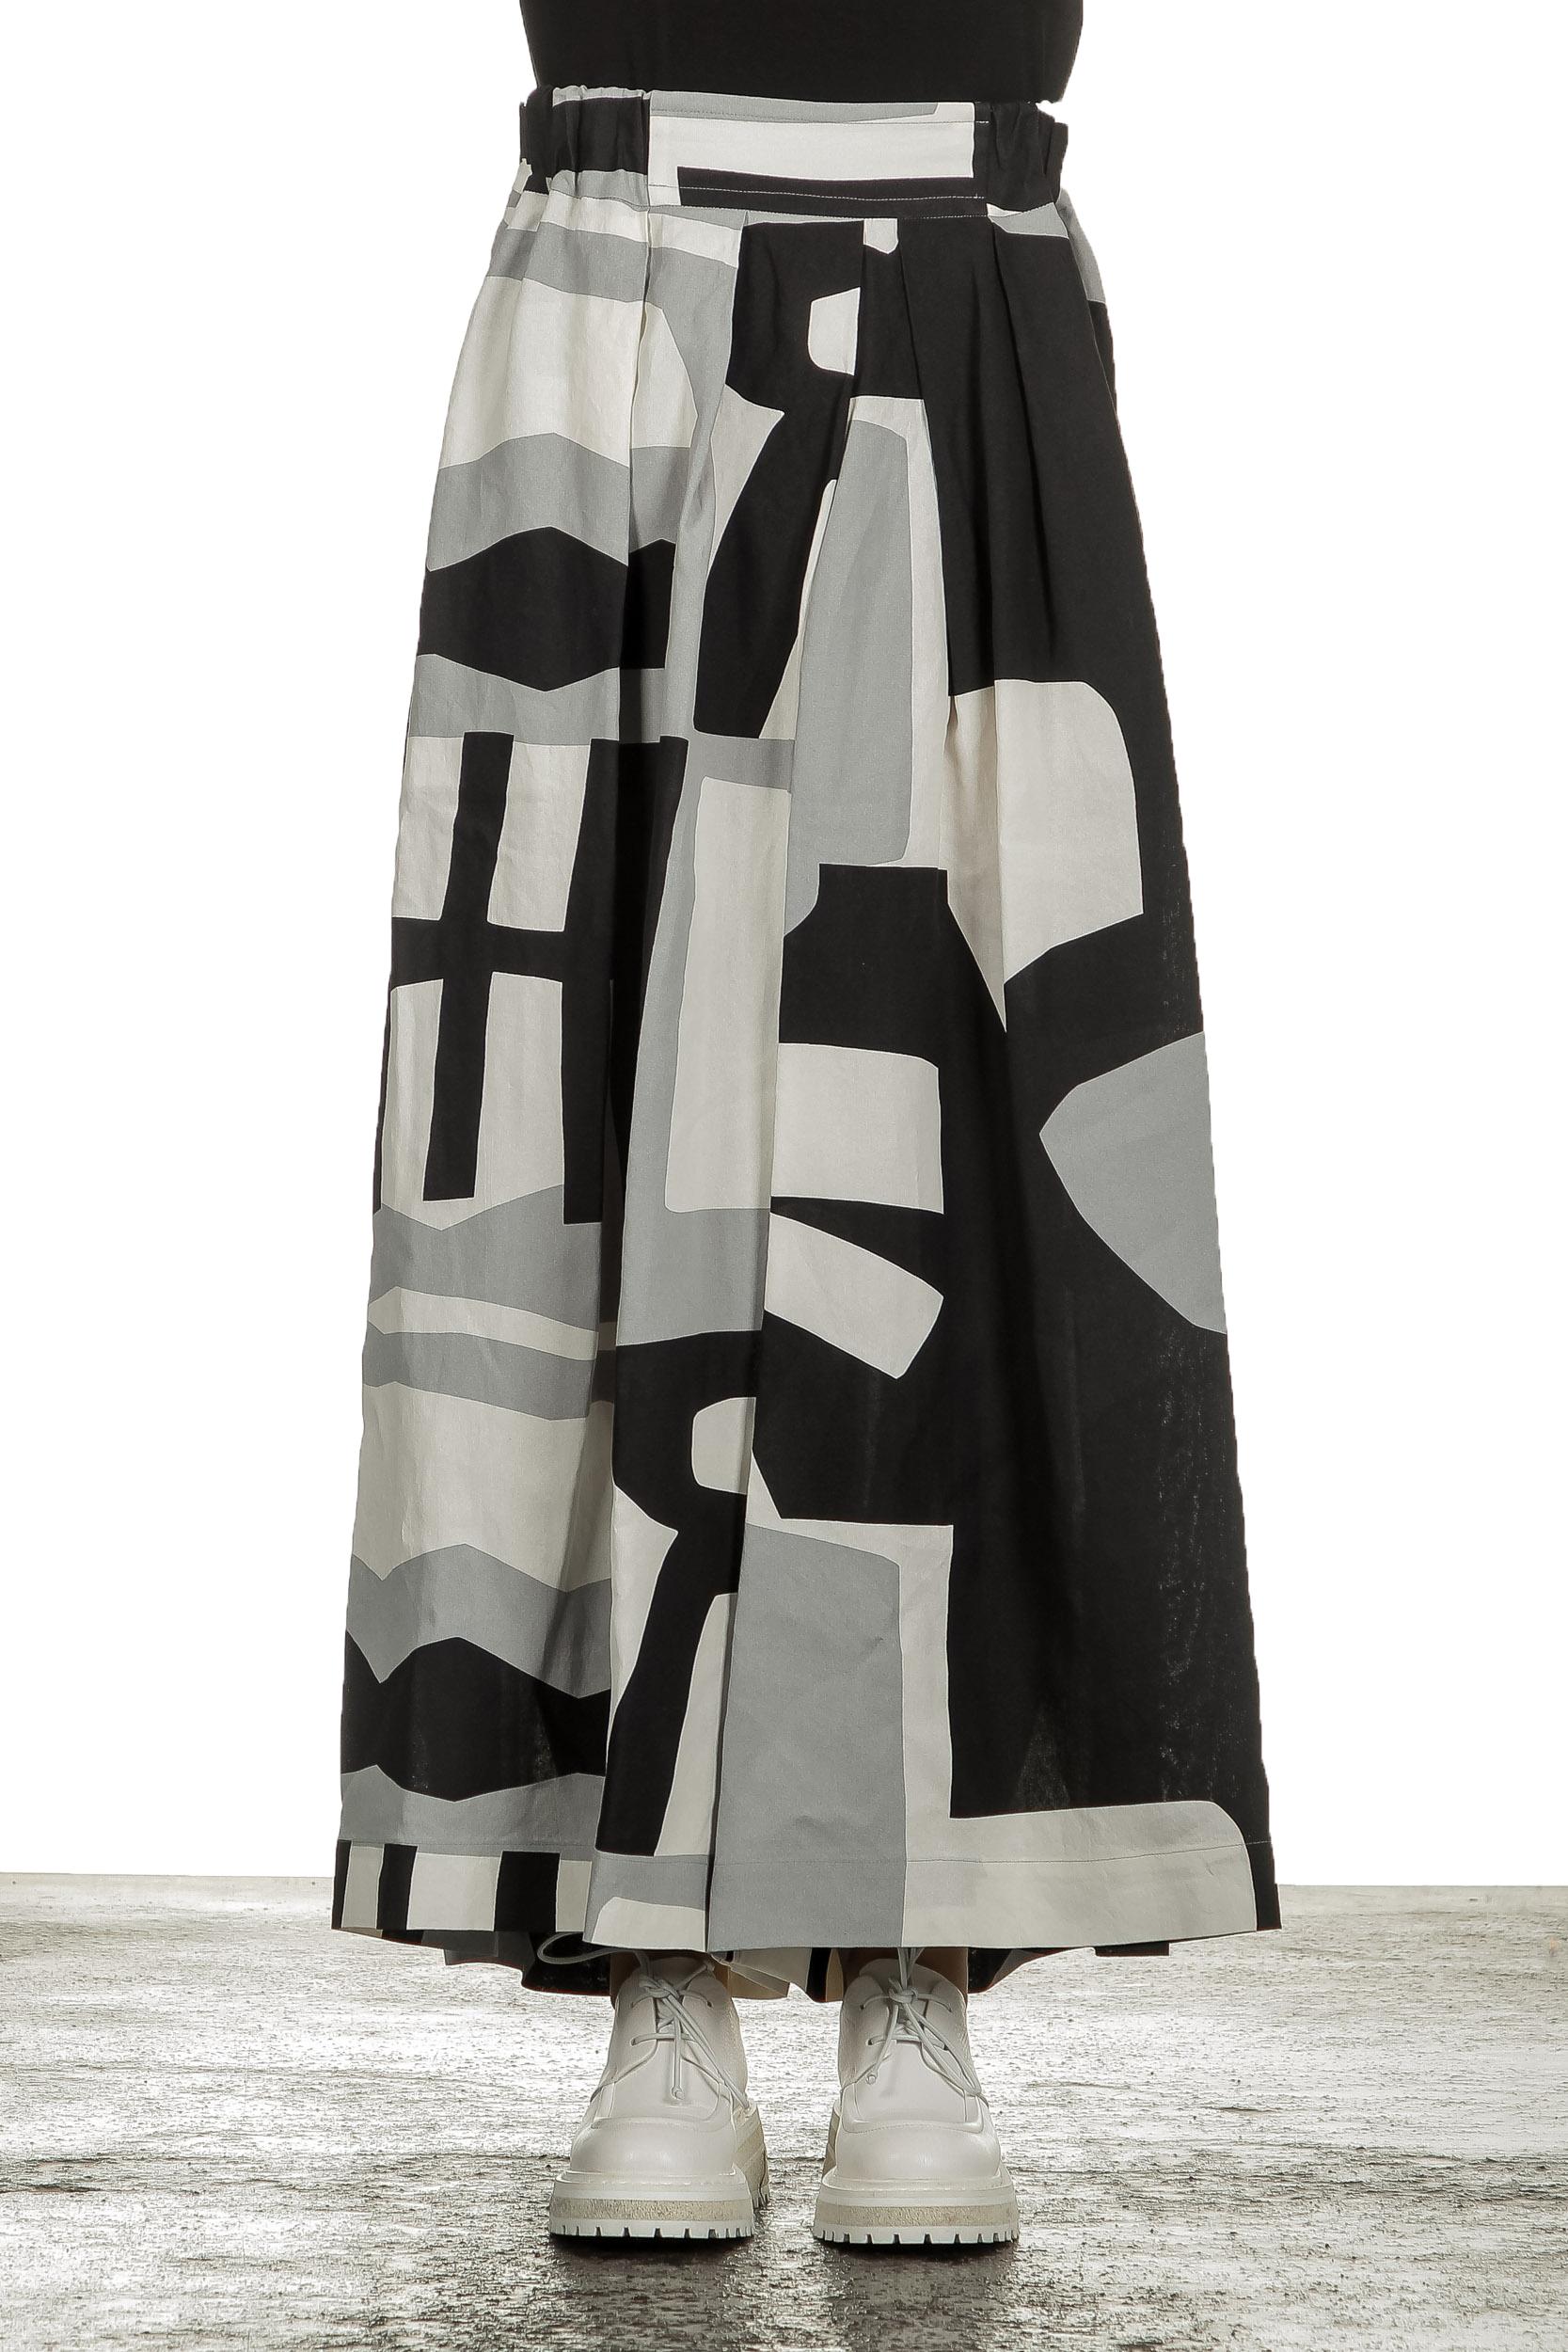 Hosen - Issey Miyake Avantgarde Damen Hose mit Print mehrfarbig  - Onlineshop Luxury Loft